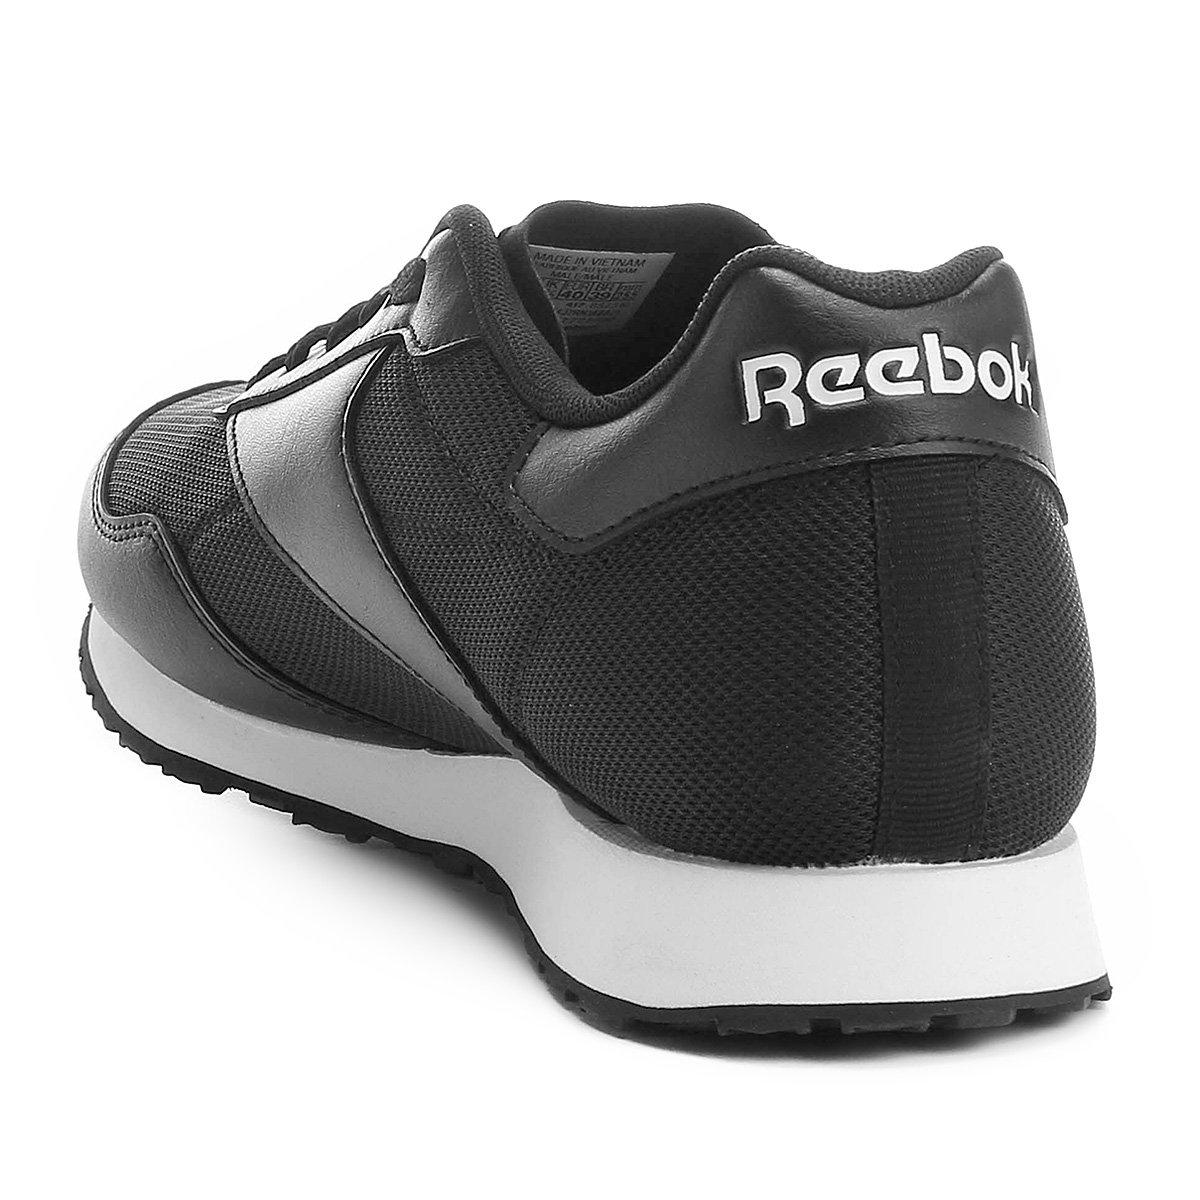 Tênis Reebok Royal Dimension Masculino - Compre Agora  9559a5652c4e2